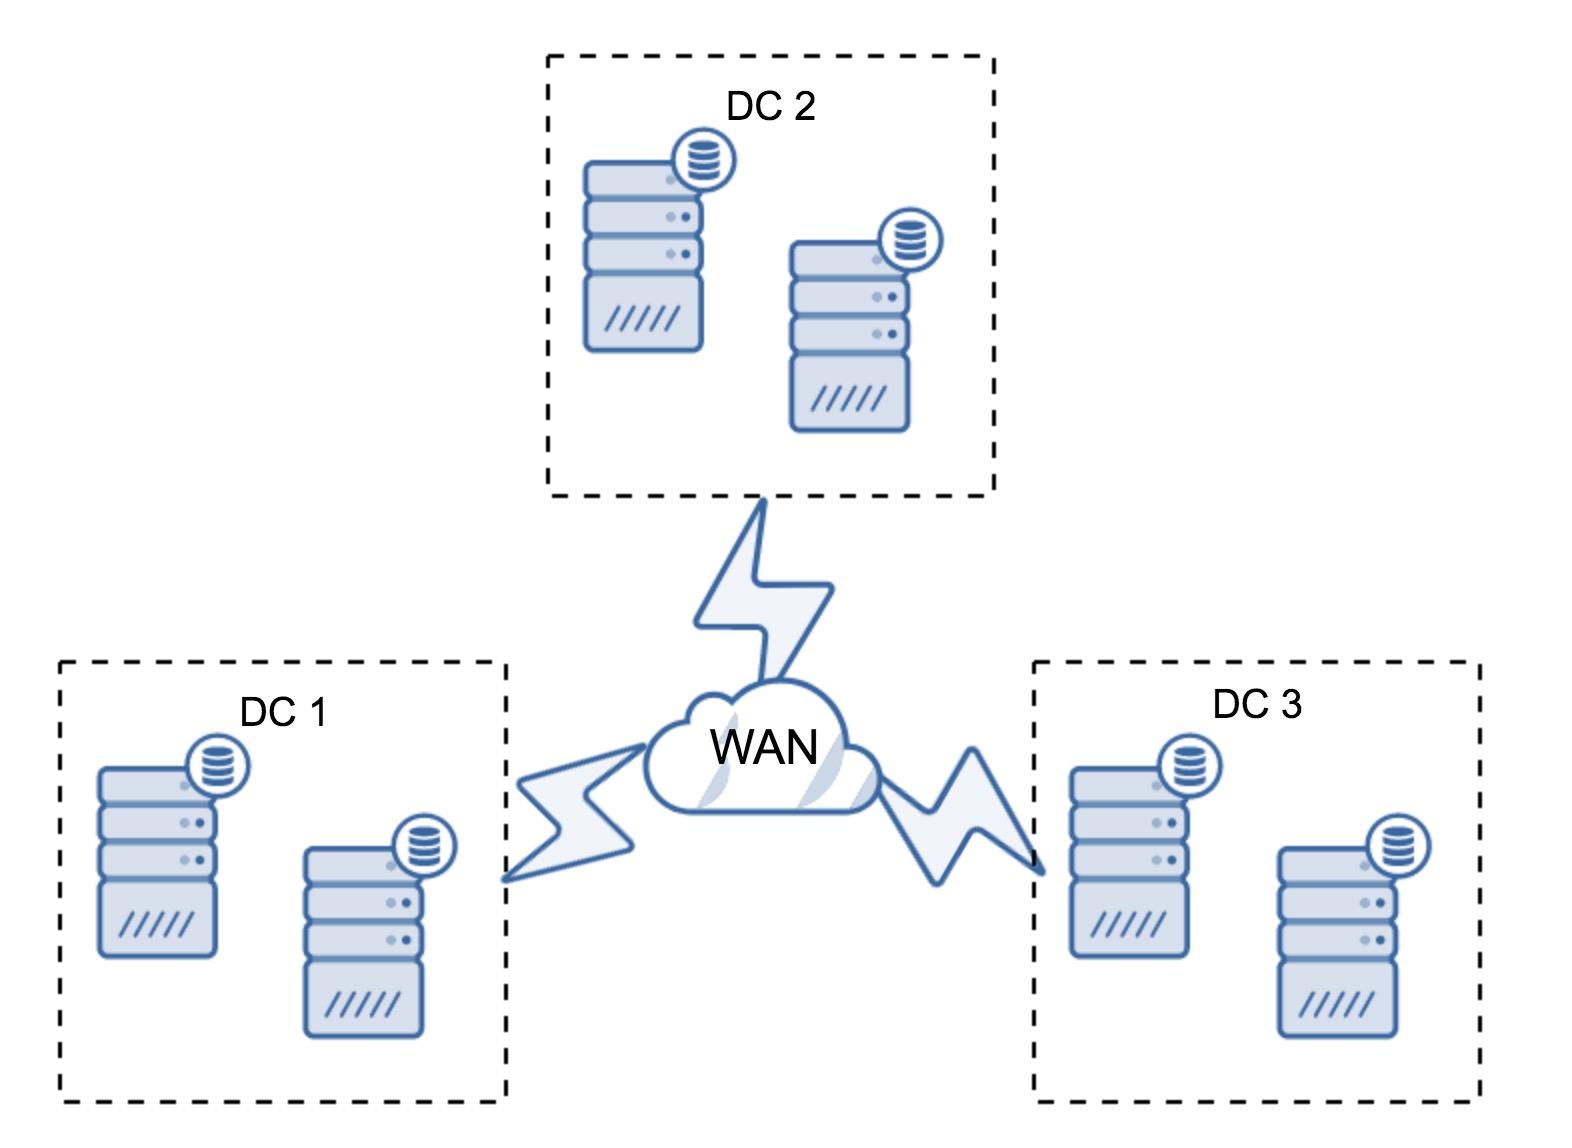 Fan Center Relay Wiring Diagram Http Wwwladsmcom Forum Viewtopic